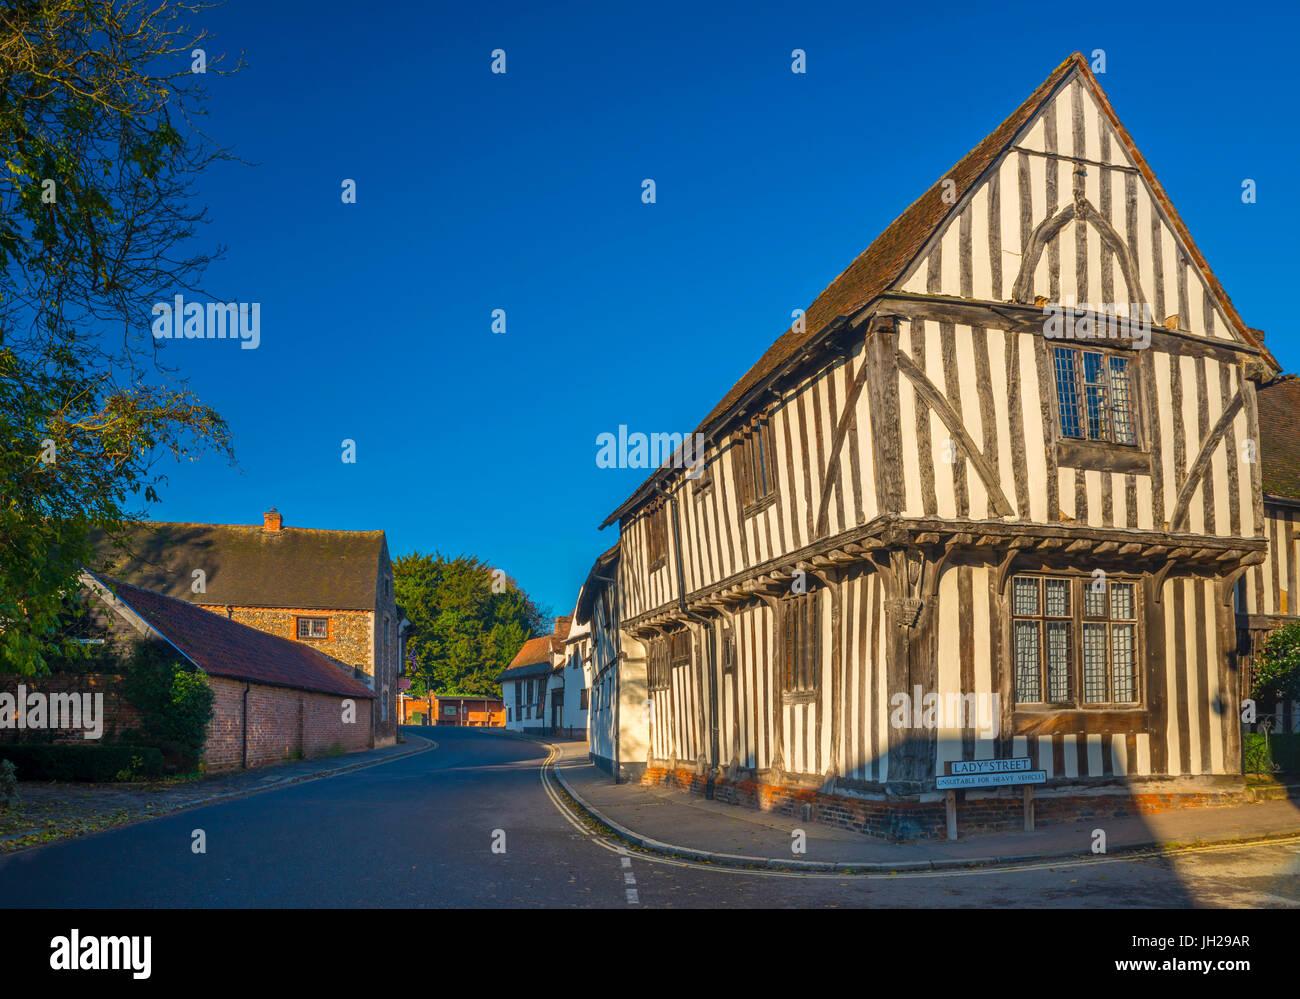 Corner of Water Street and Lady Street, Lavenham, Suffolk, England, United Kingdom, Europe - Stock Image